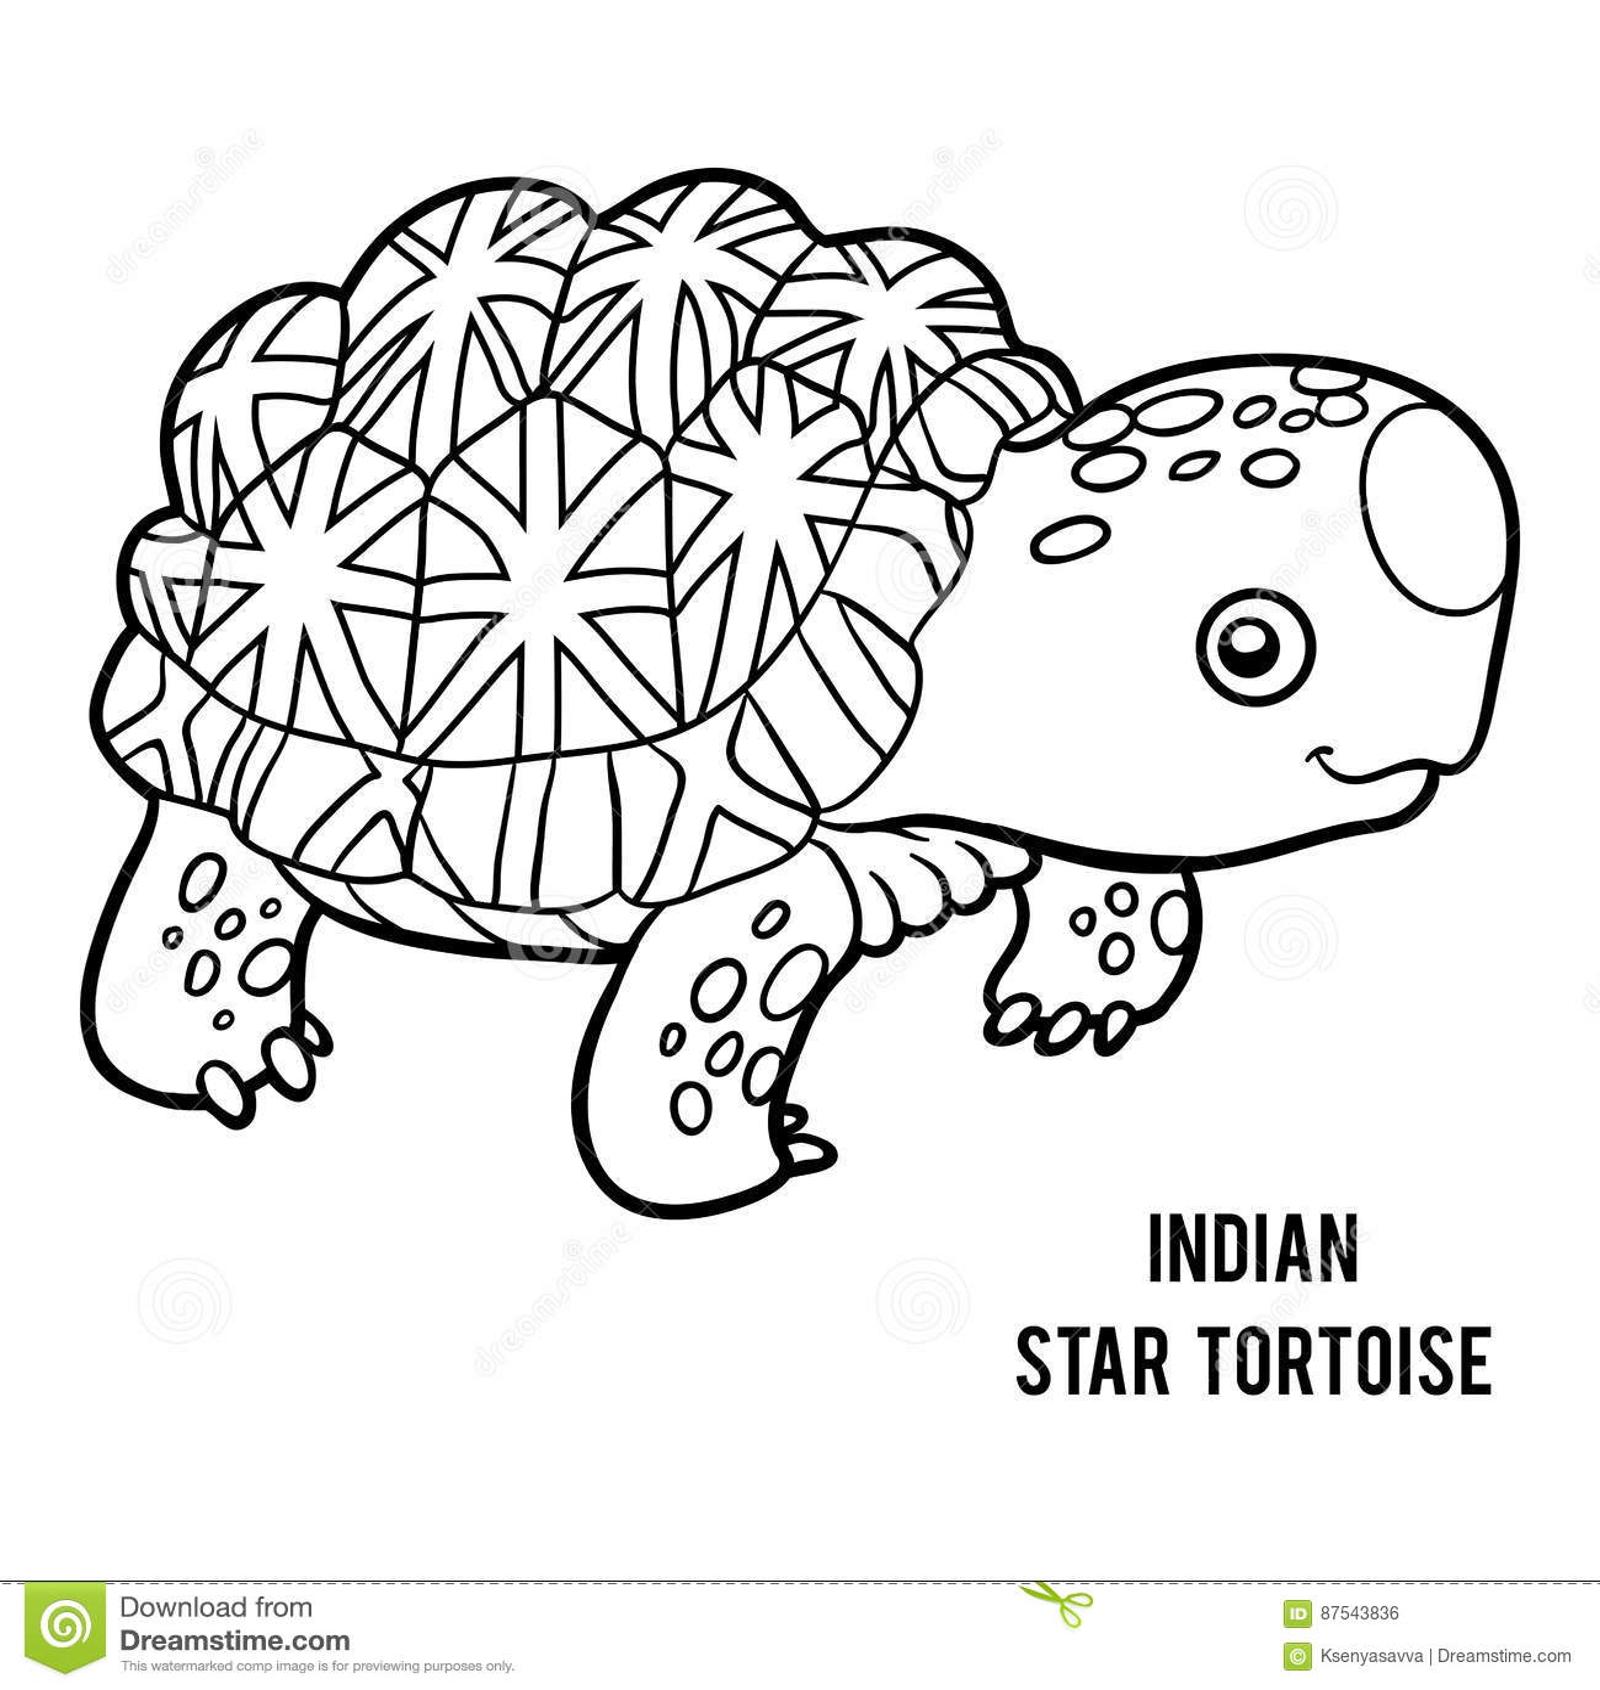 Indian Star Tortoise Cartoon Vector